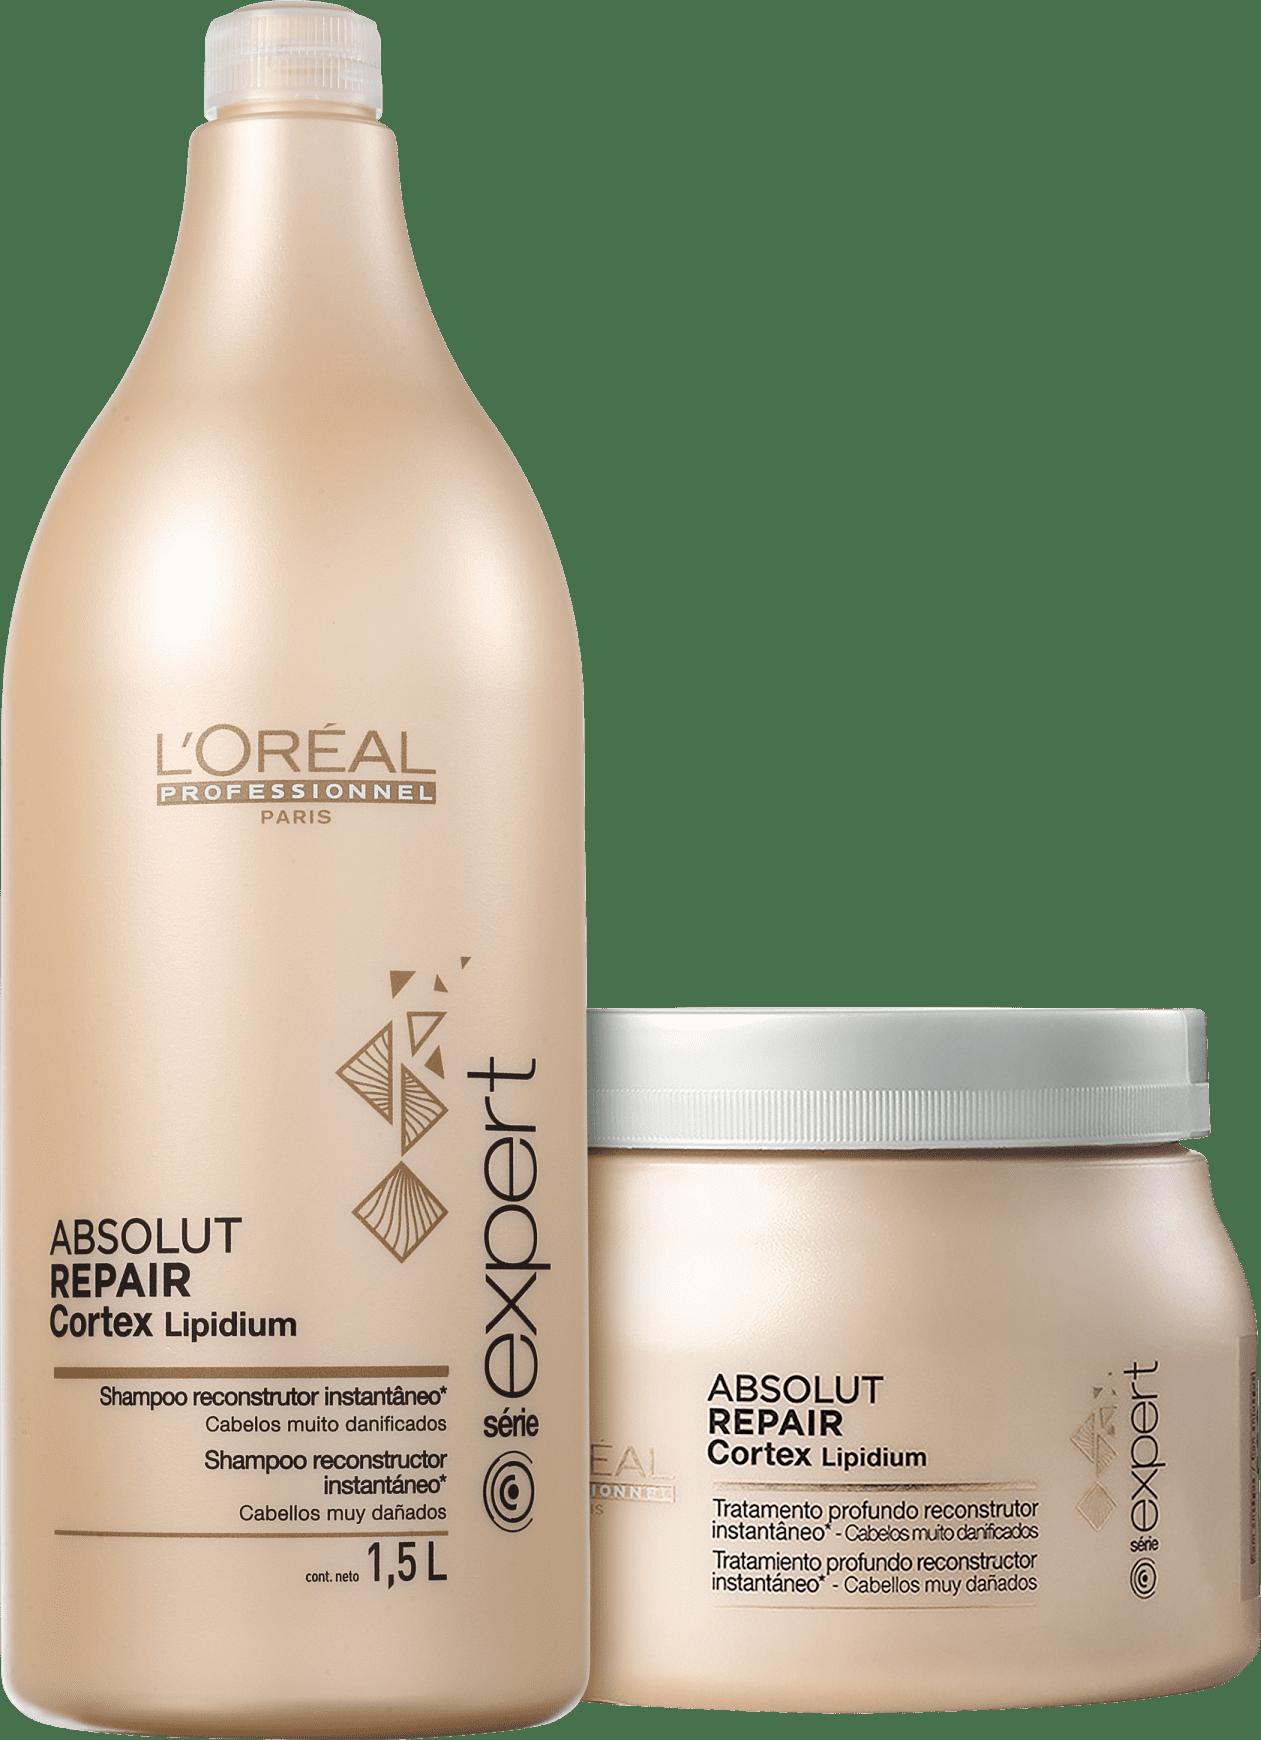 9b72b0fac Kit L'Oréal Professionnel Expert Absolut Repair Cortex Lipidium Duo Salon  (2 Produtos)